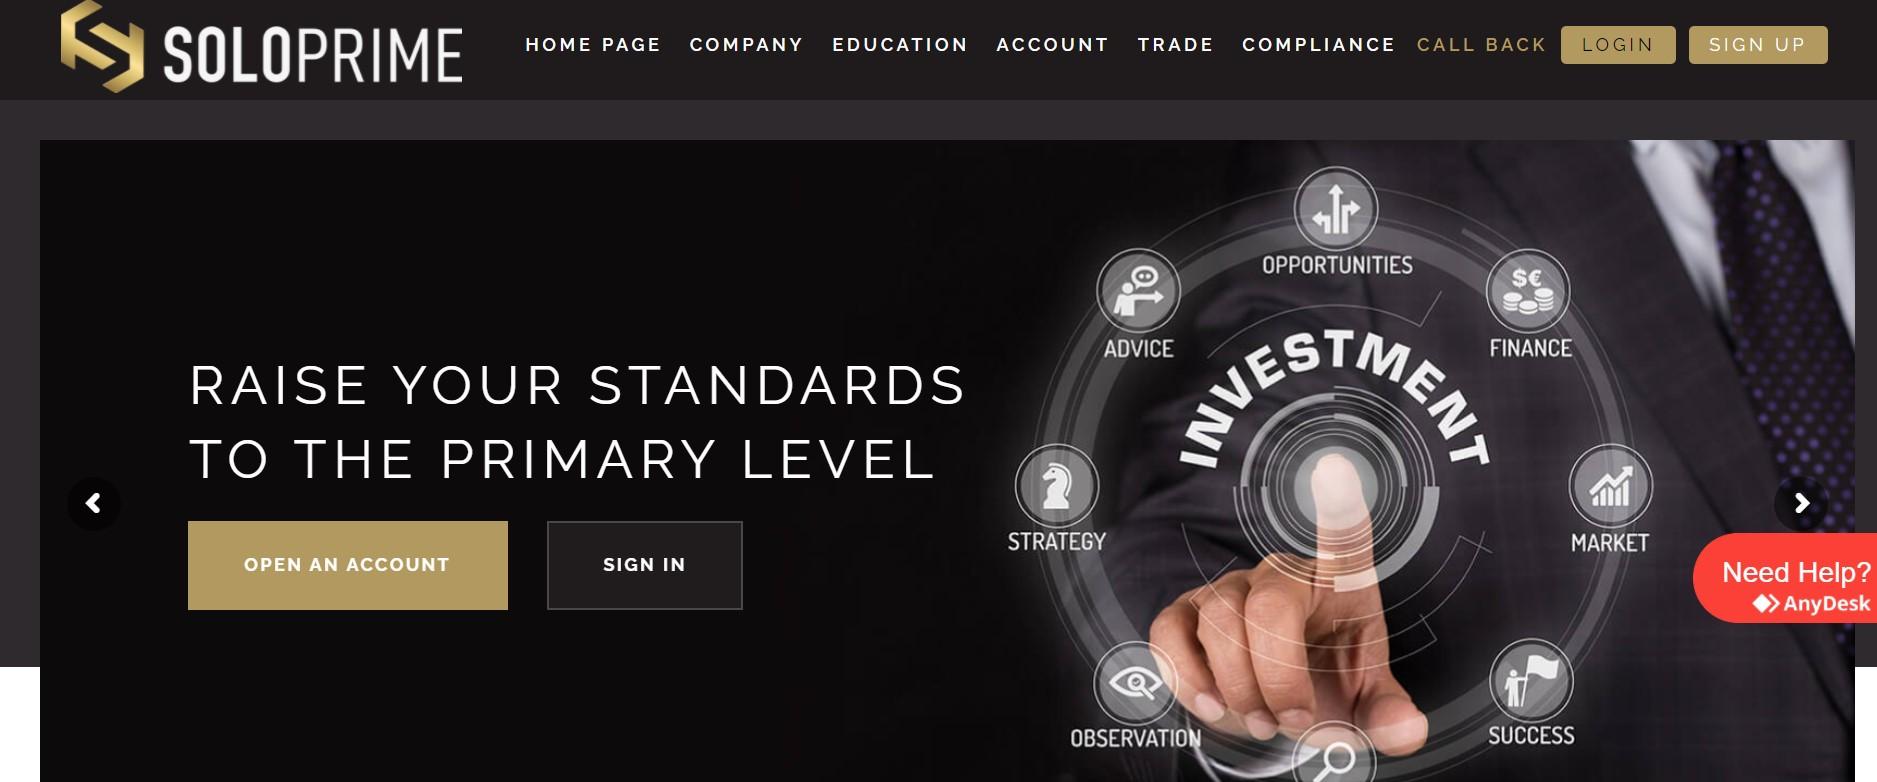 Soloprime website